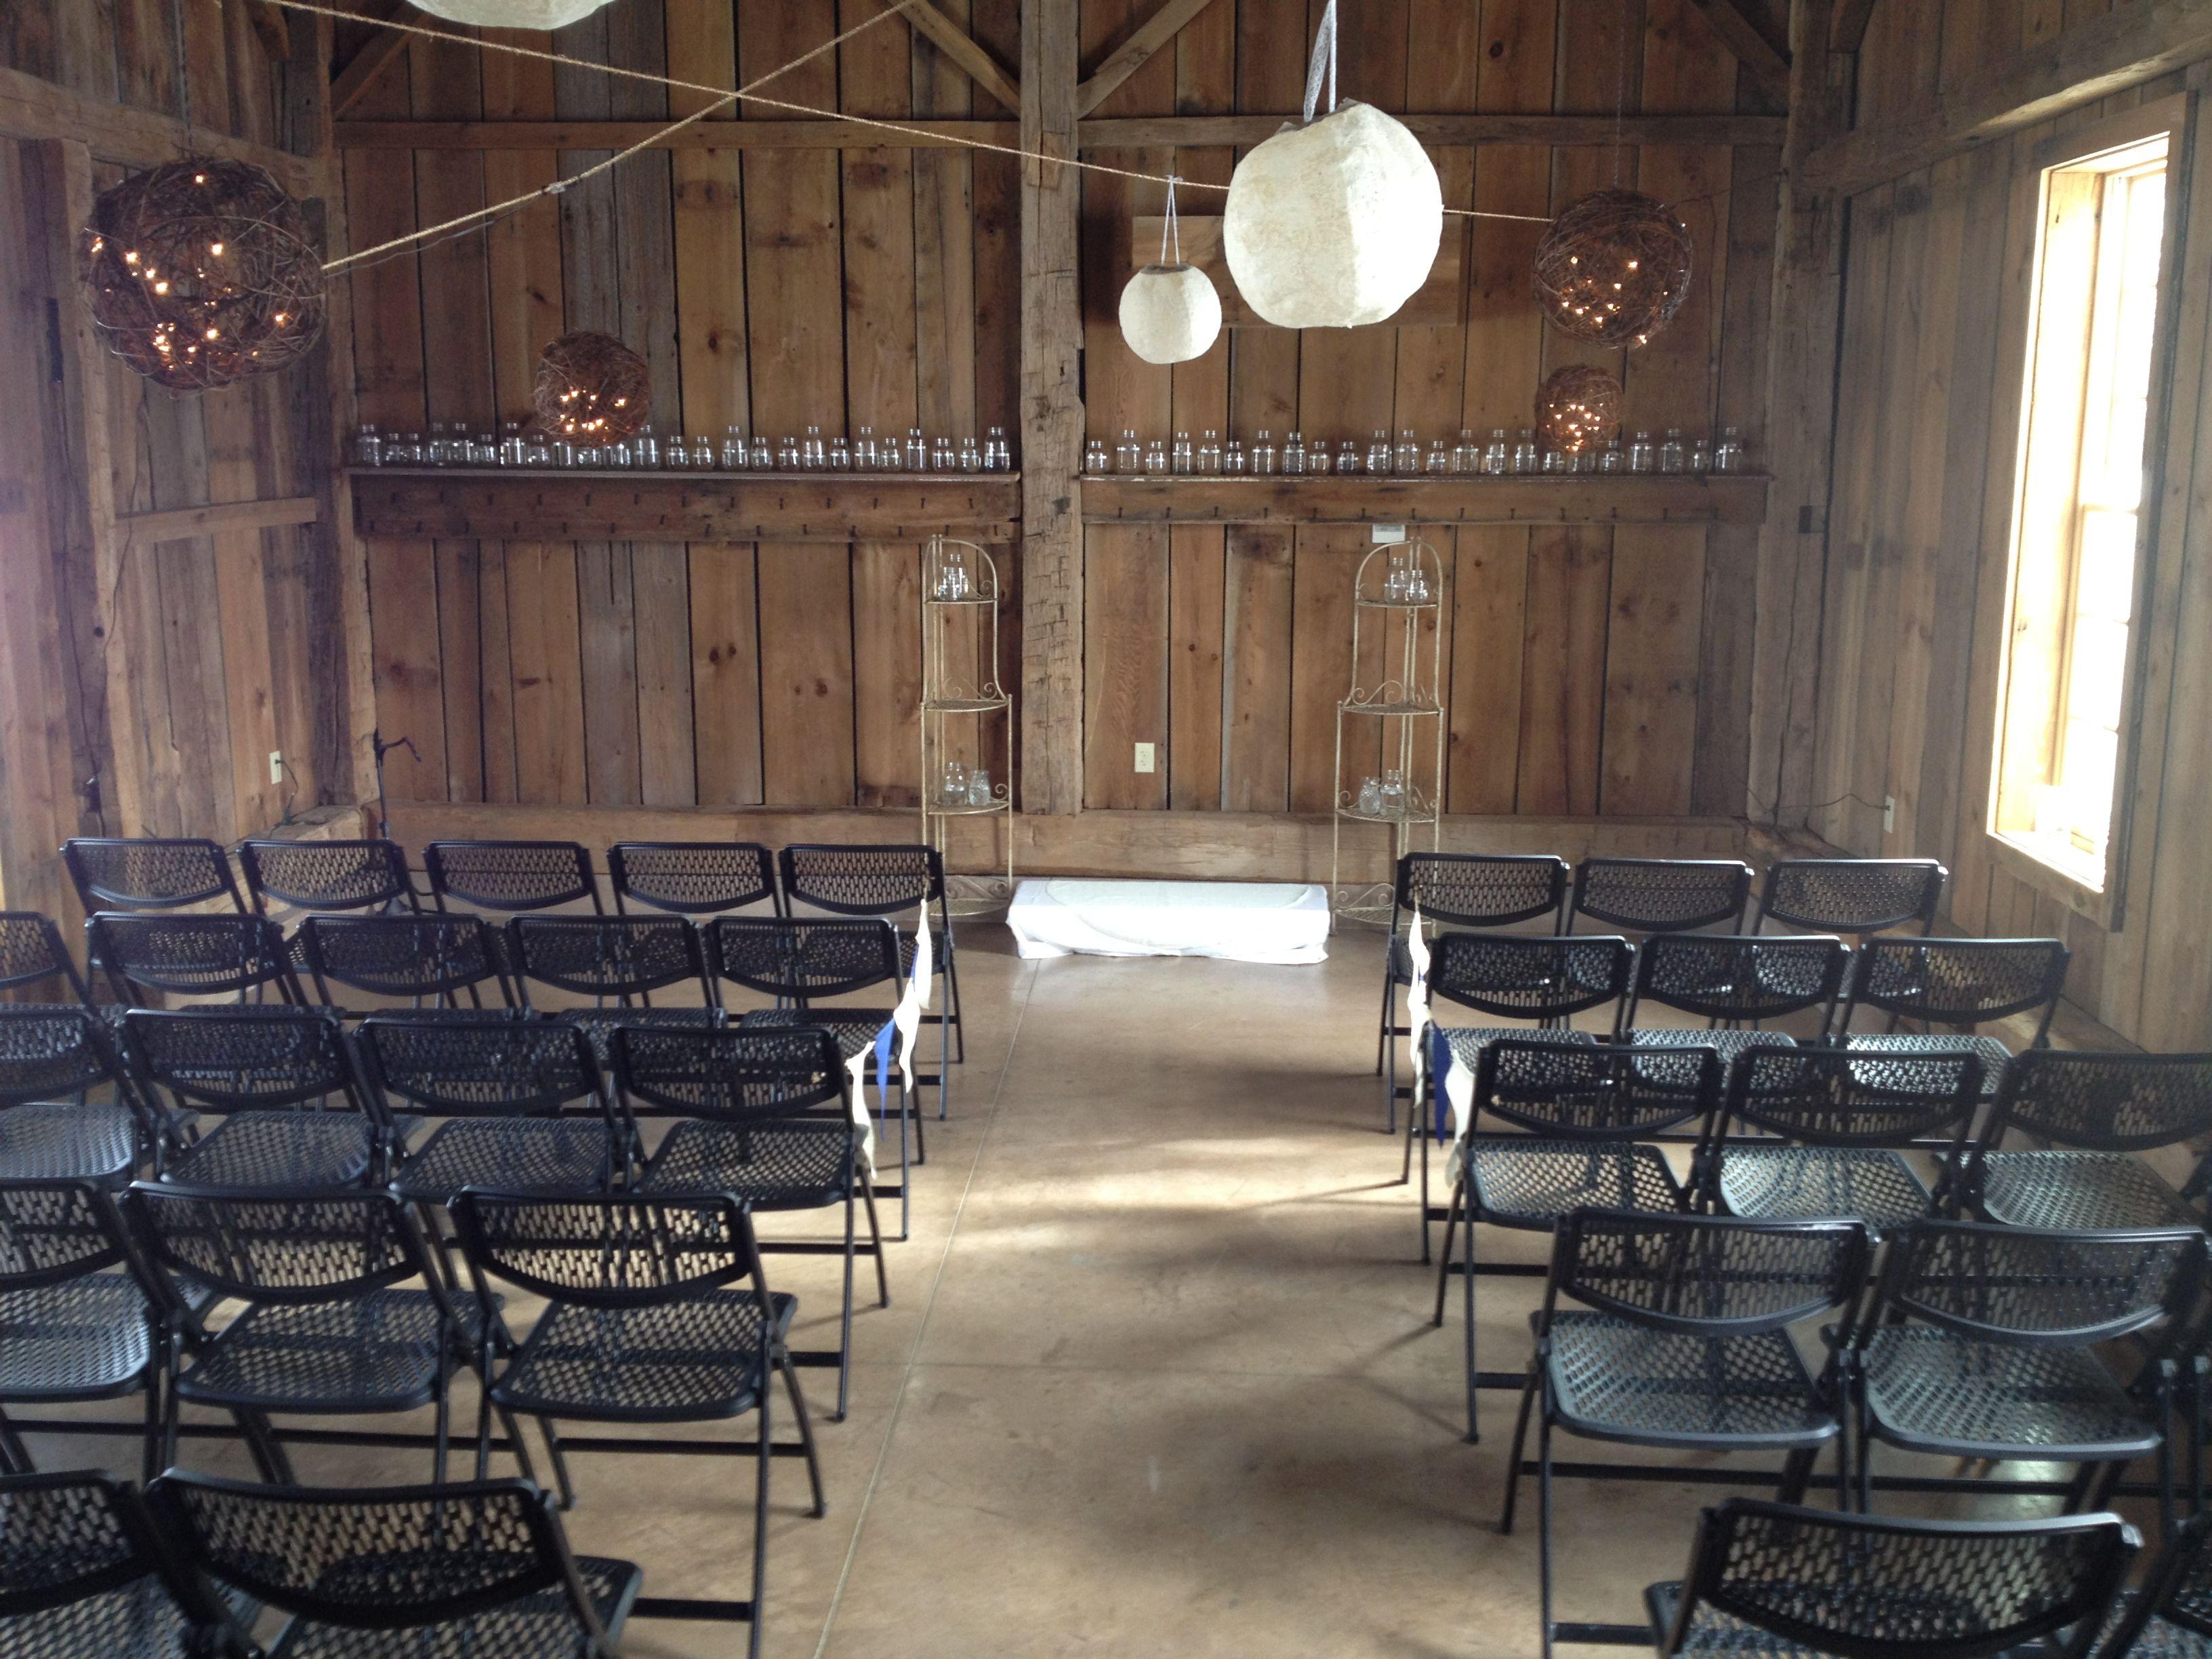 An Indoor Rustic Ceremony: Rustic Indoor Wedding Ceremony At The Amelita Mirolo Barn